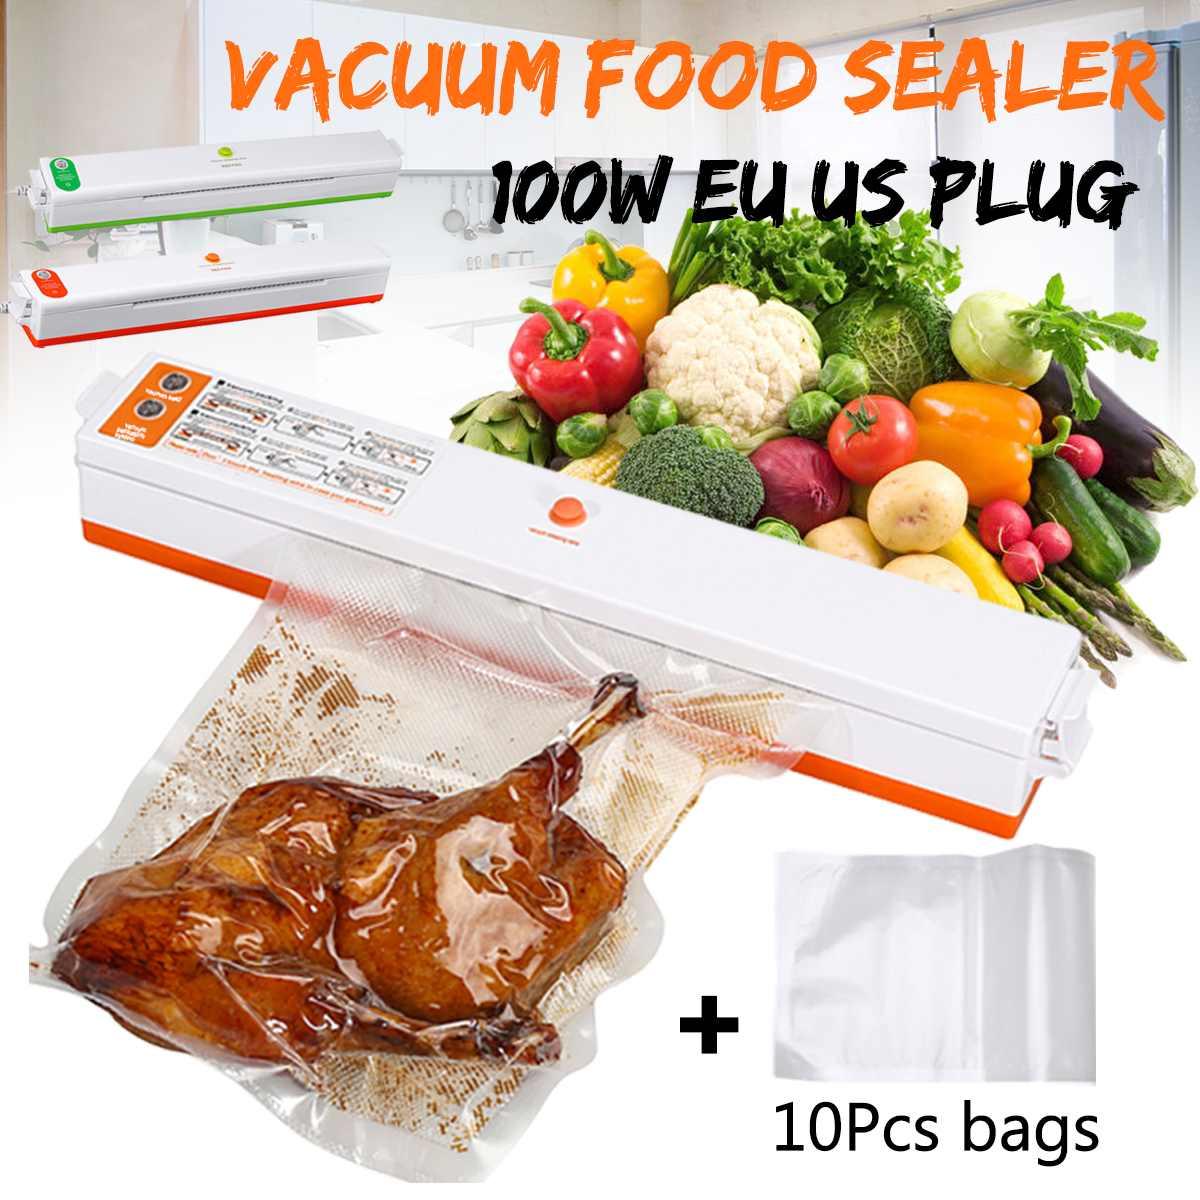 200V Household Food Vacuum Sealer Packaging Machine Film Sealer Vacuum Packer Including With 10Pcs Bags EU/US Plugs